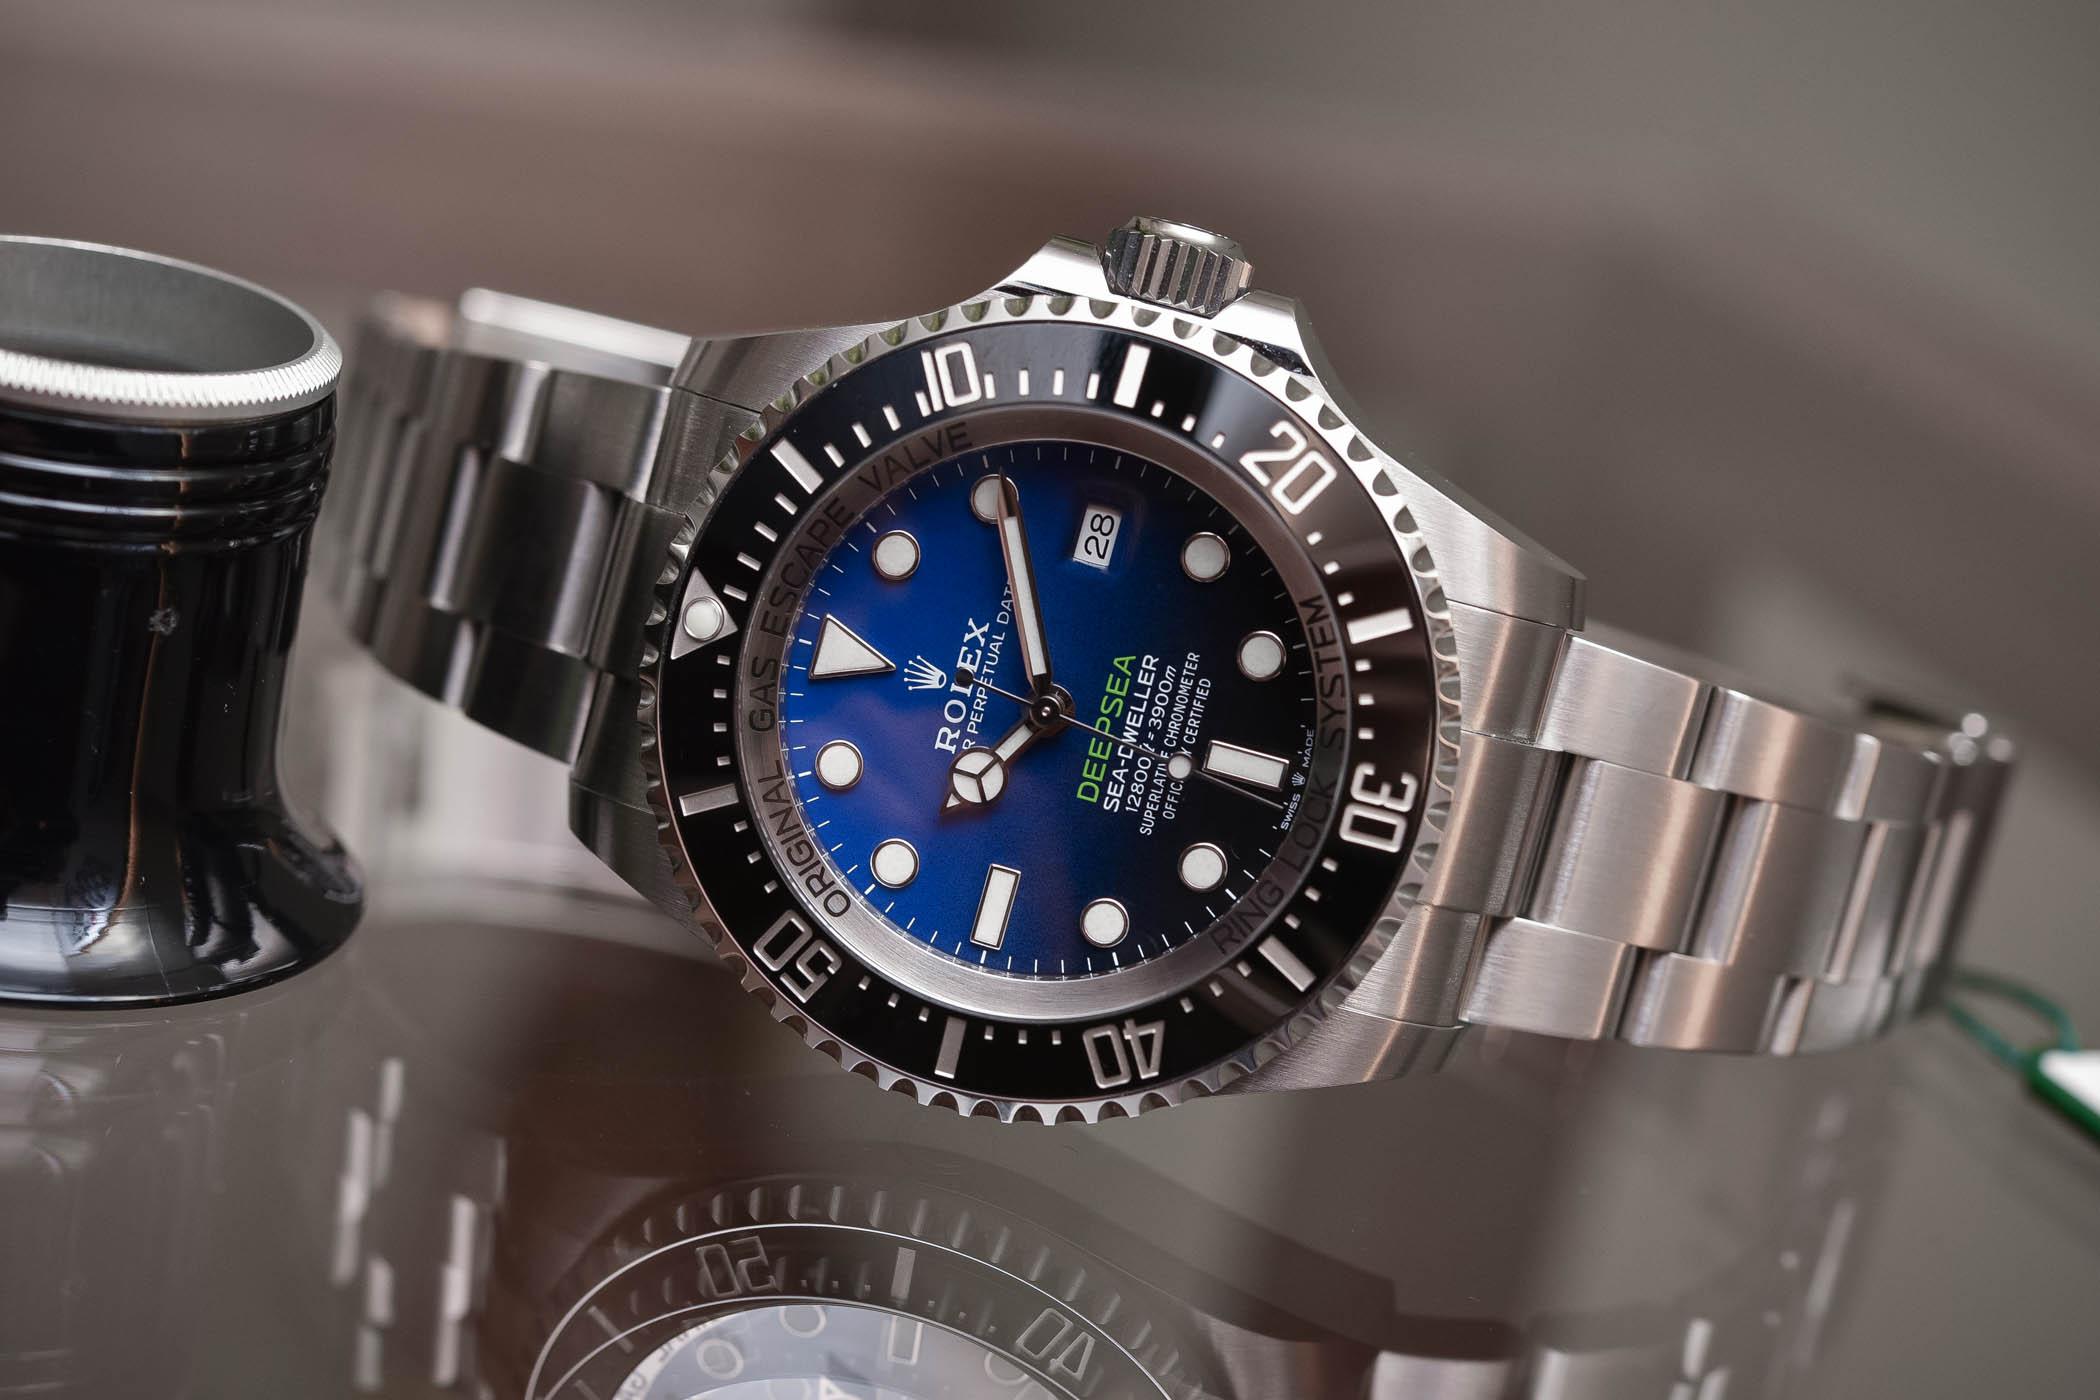 Rolex Deepsea 126660 - Baselworld 2018